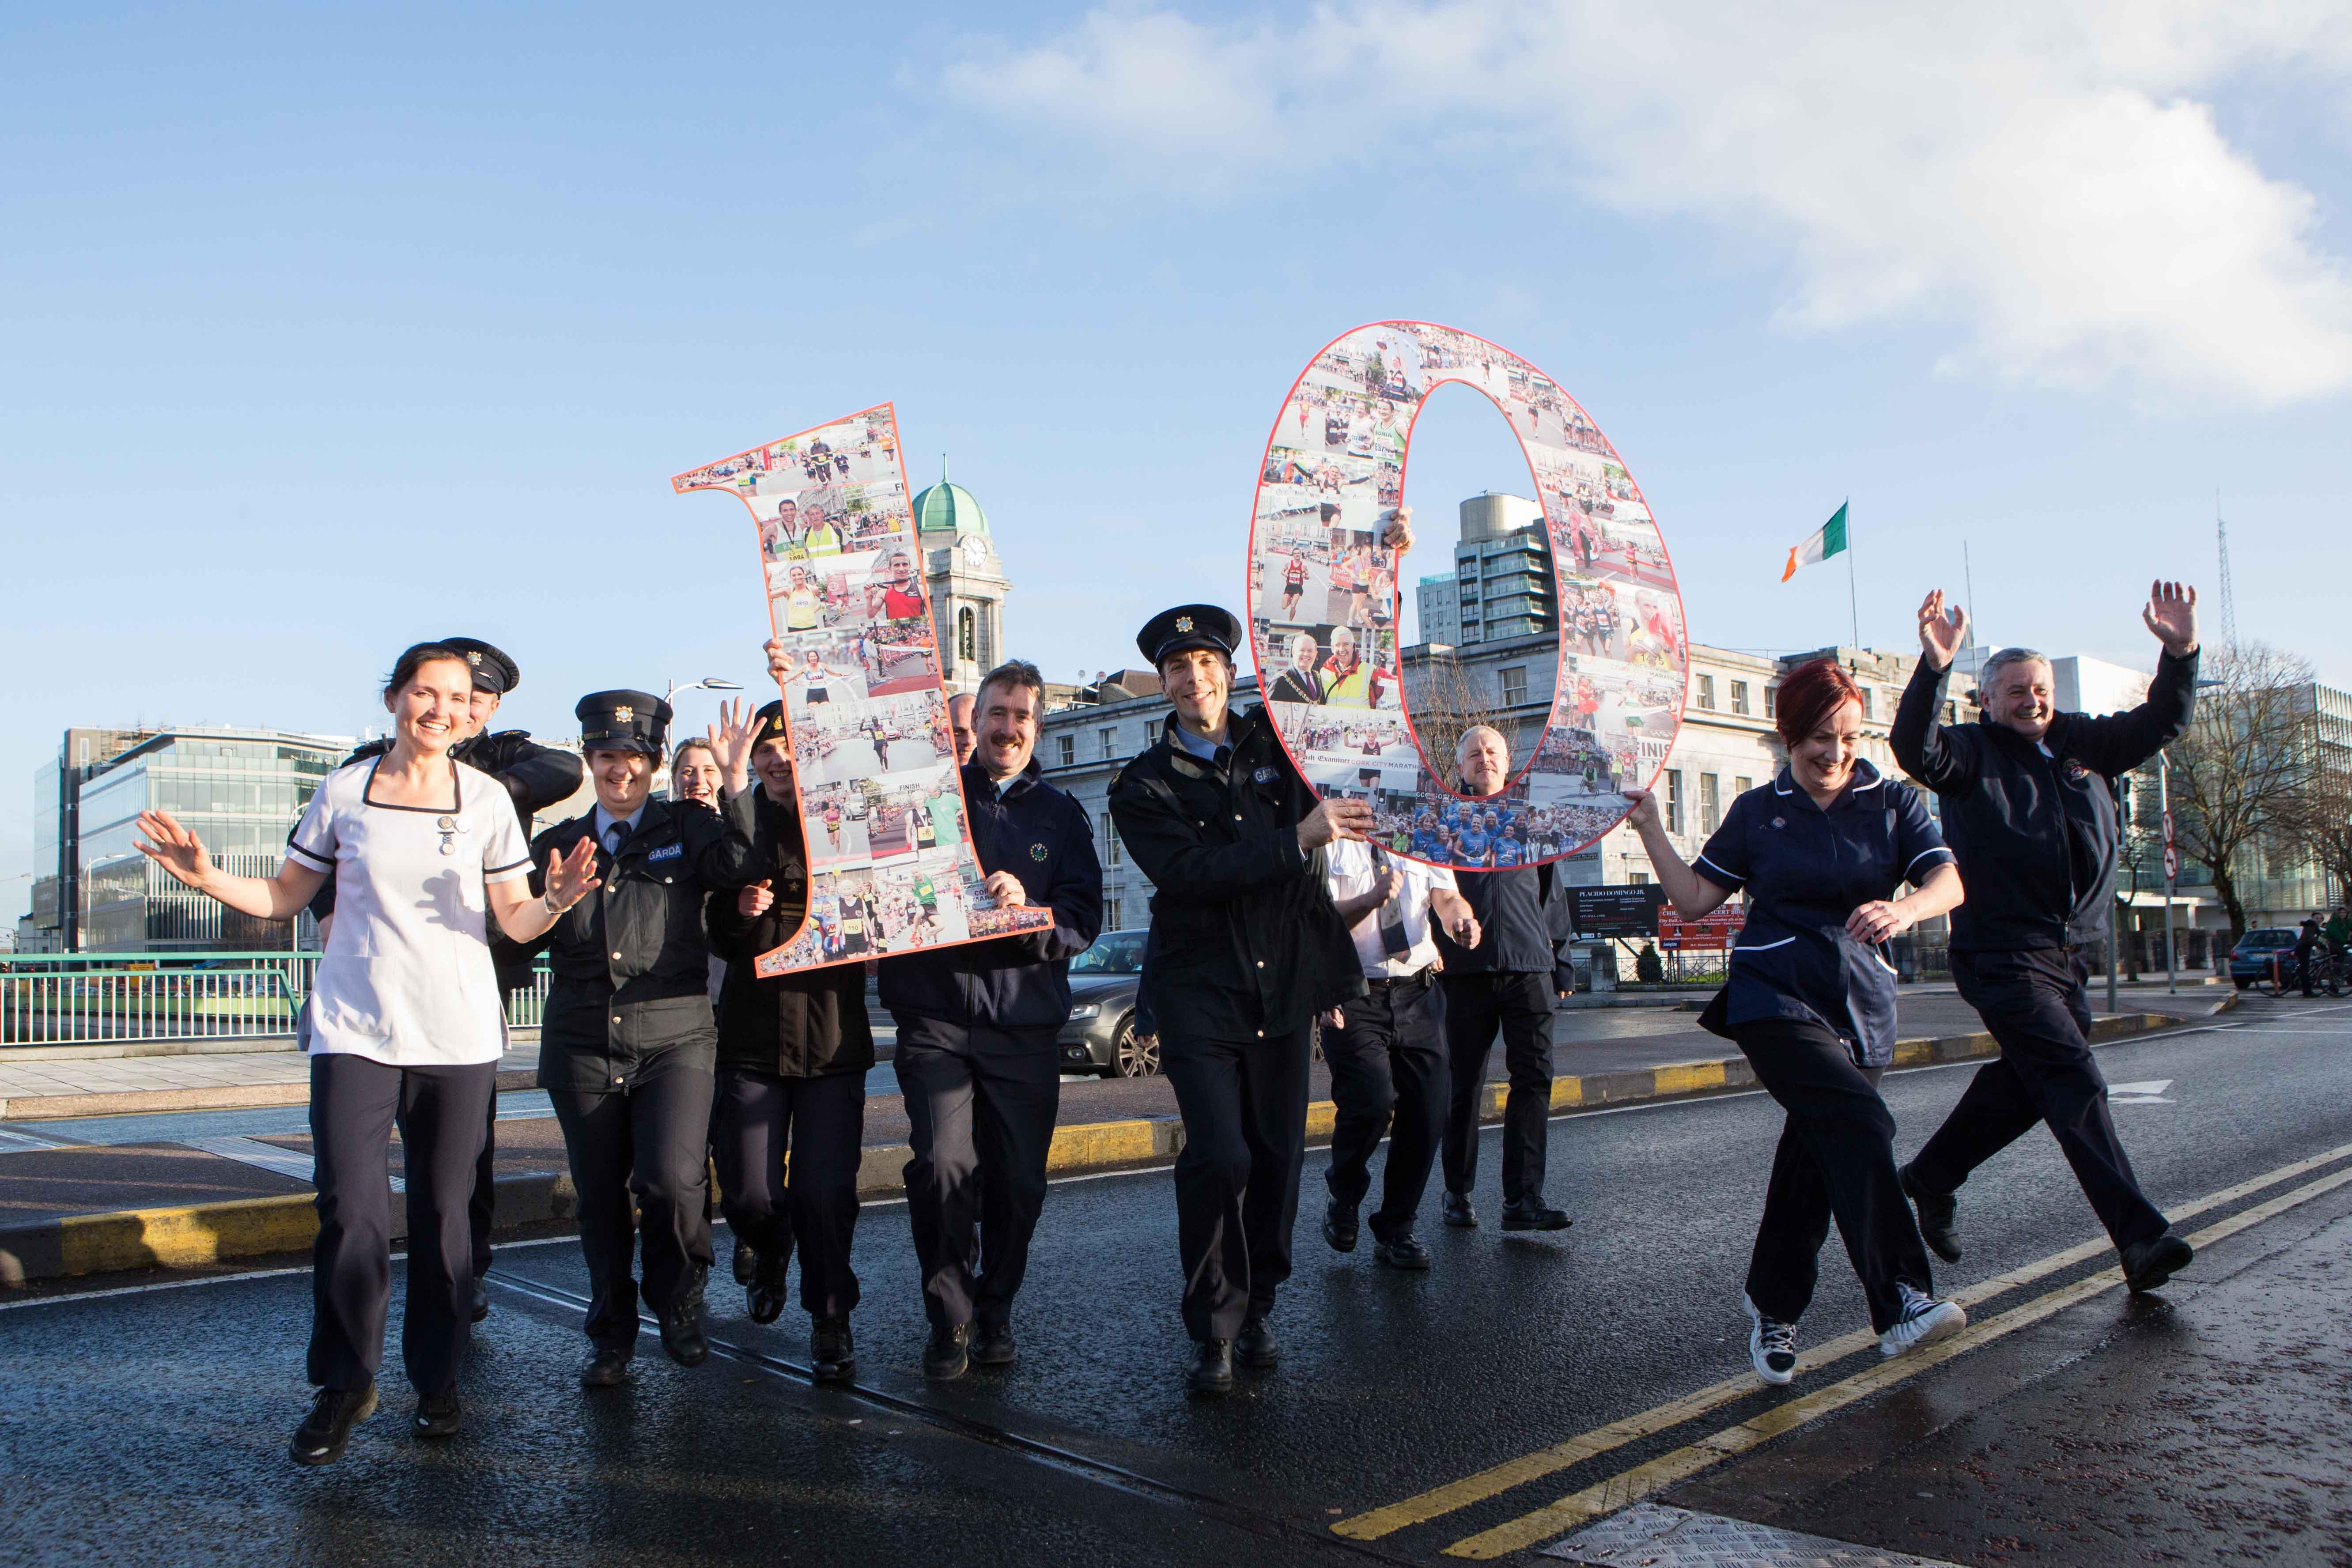 Cork City Marathon seeks Uniformed Service Personnel for 'Battle of the Badges'